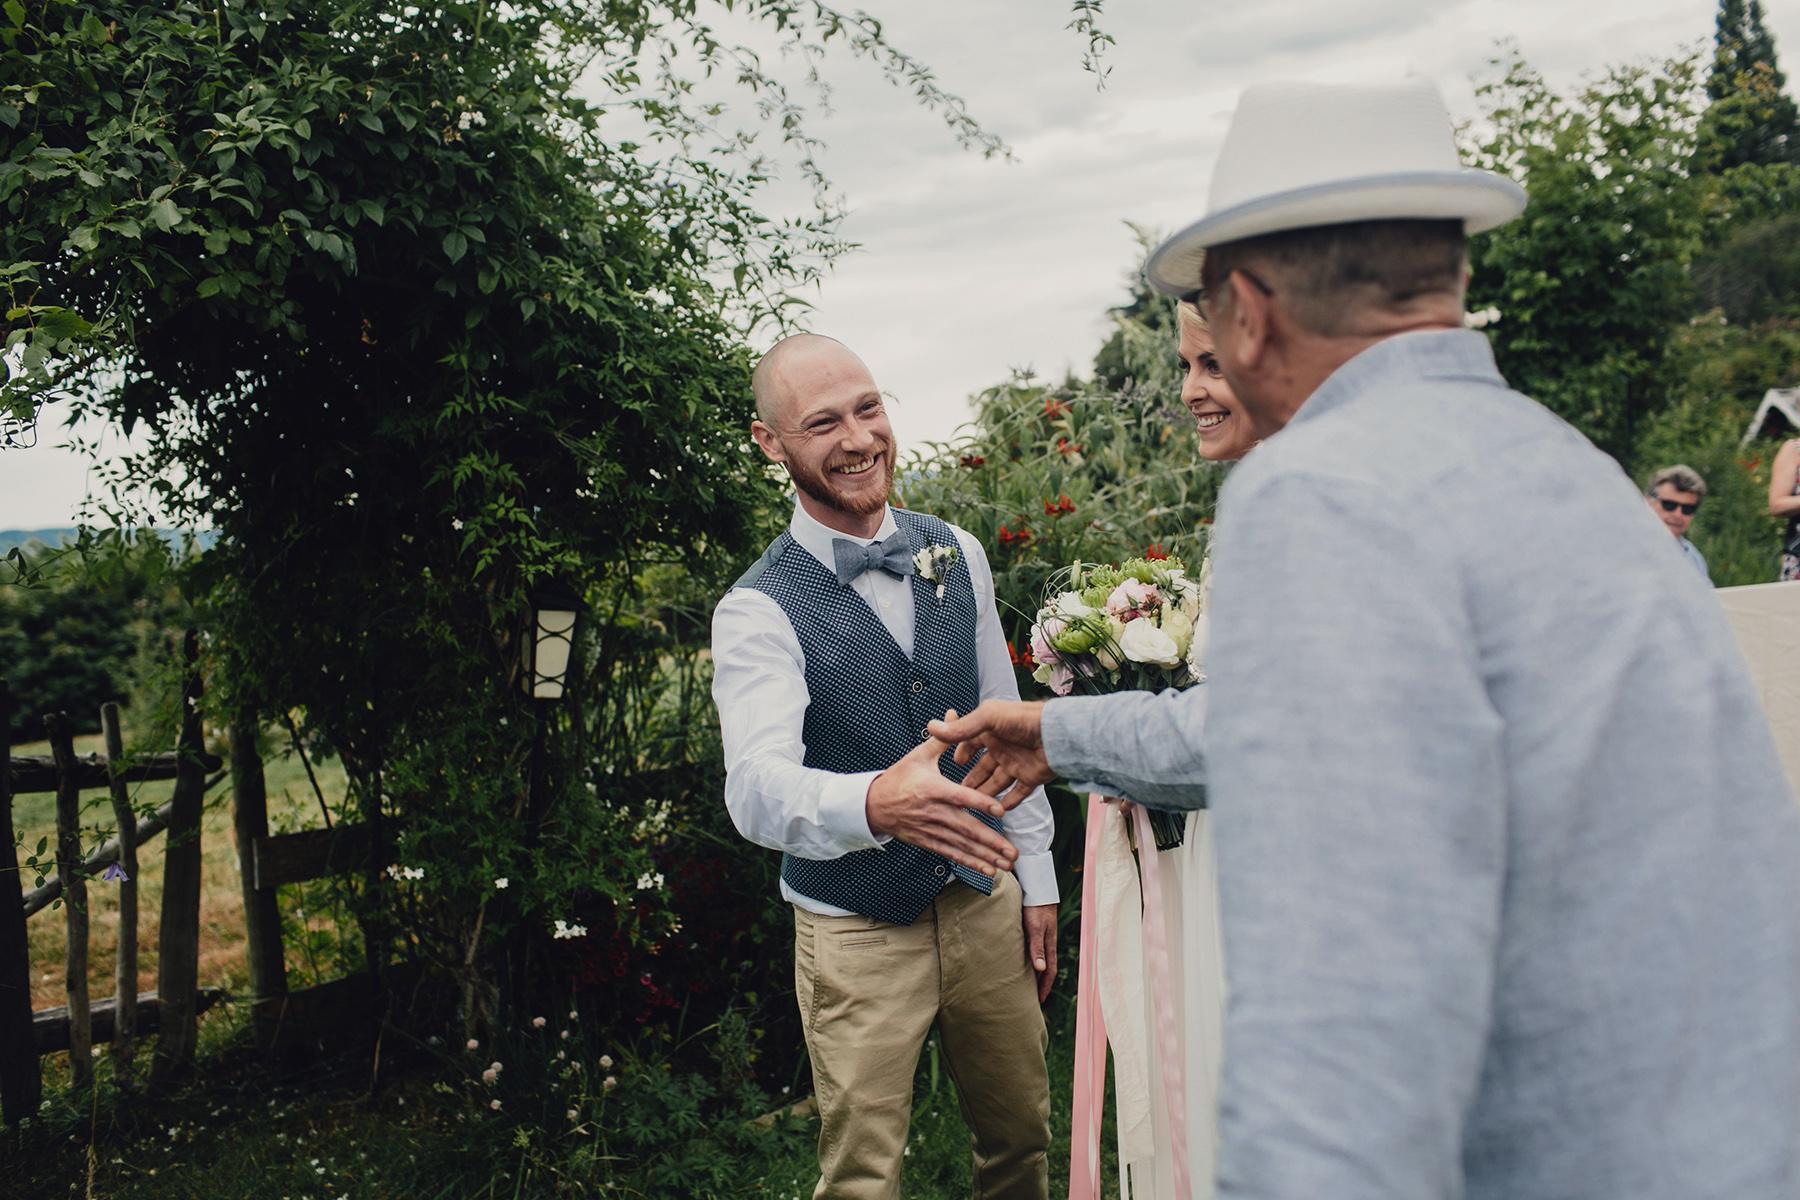 kildara-farms-wedding-photo-inspiration-0035